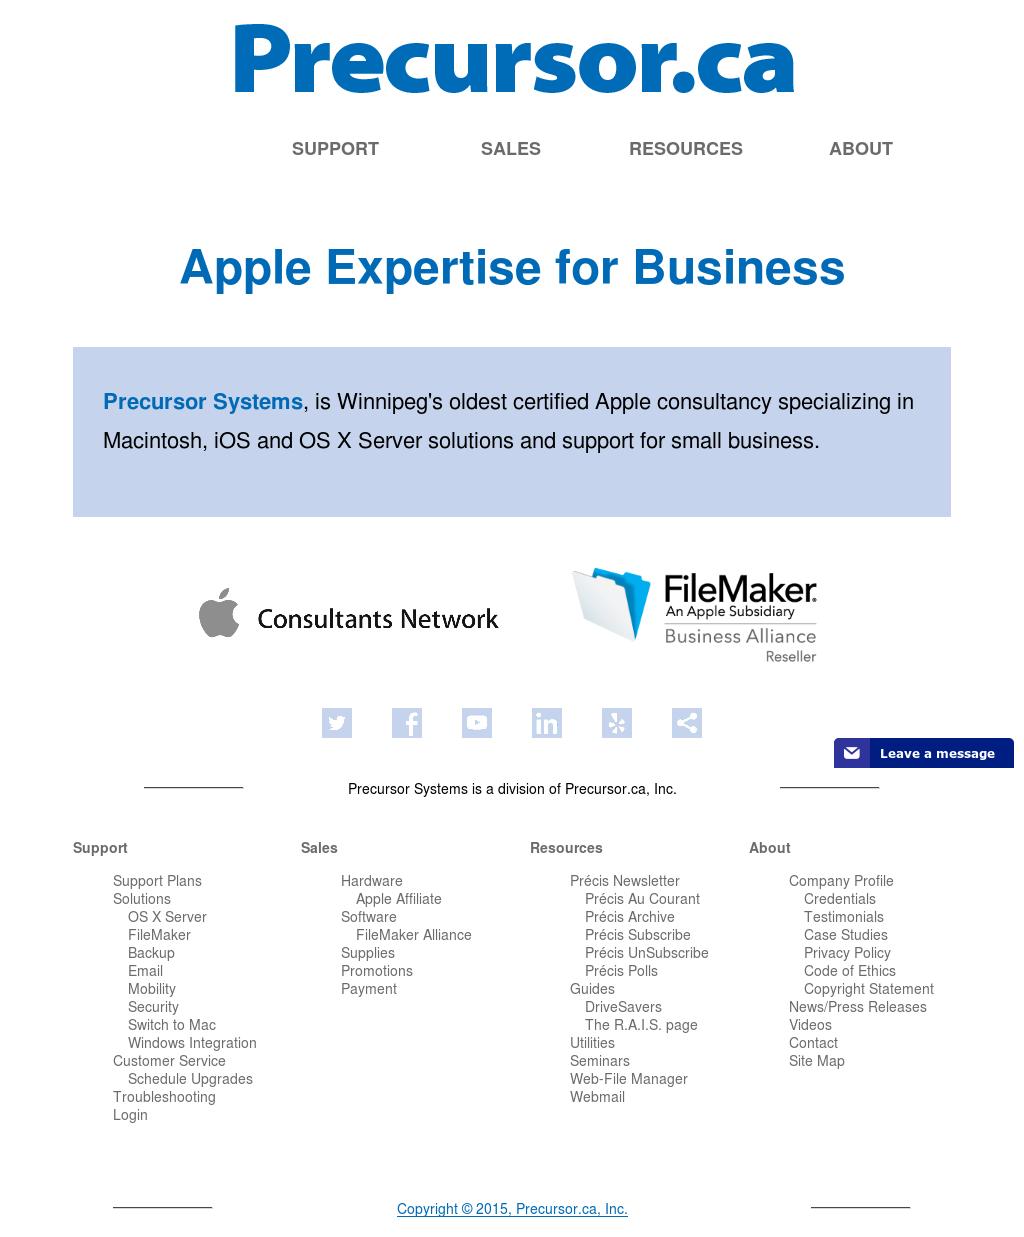 apple code of ethics statement